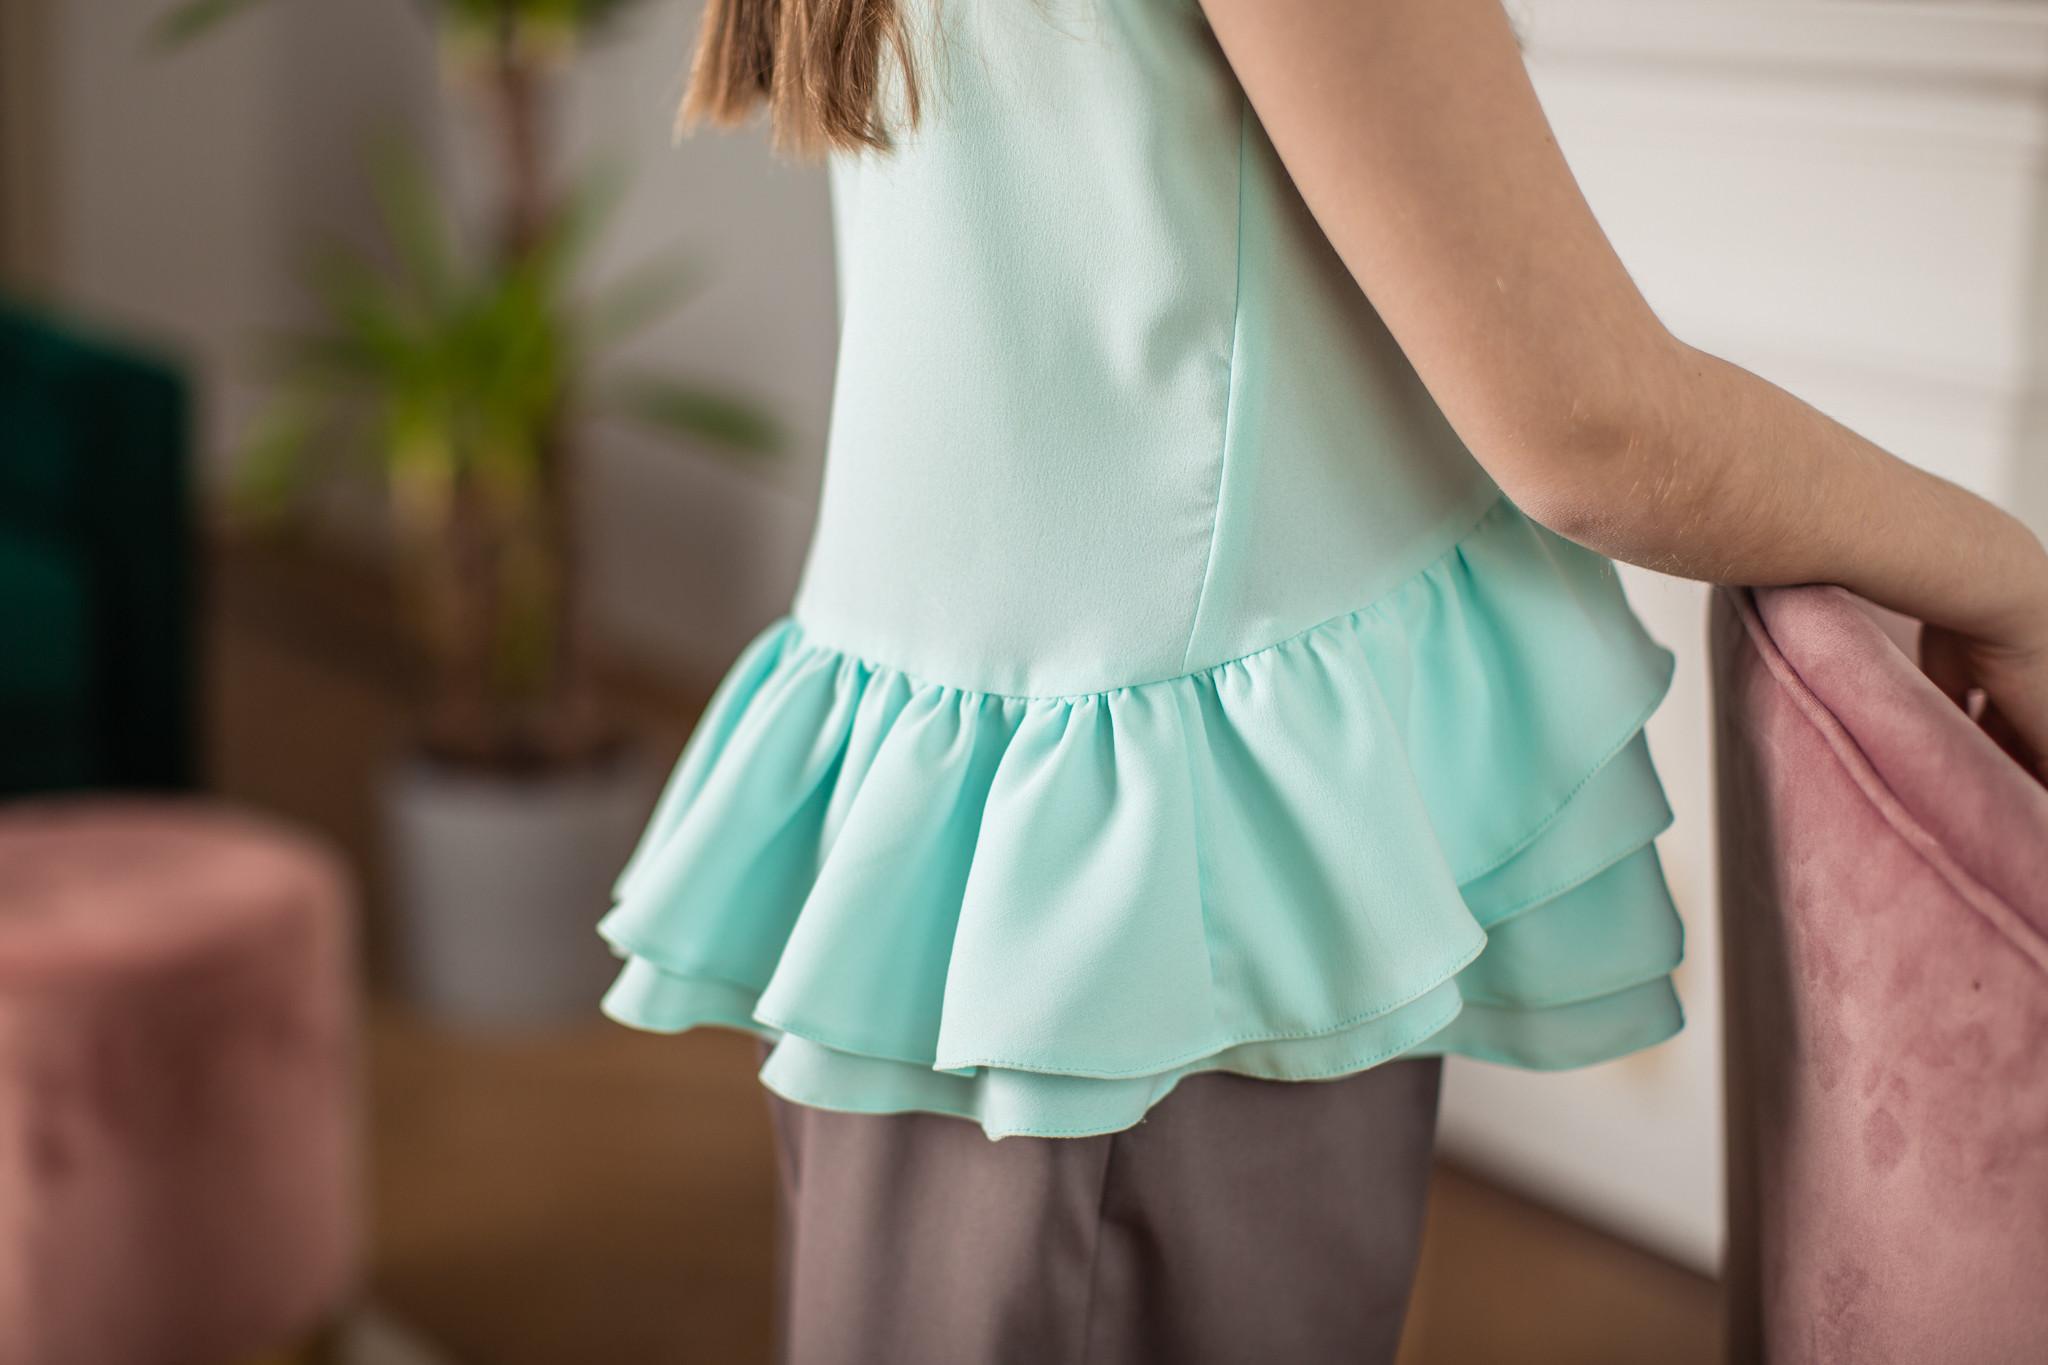 Bluzka miętowa z falbankami - Domino.little.dress